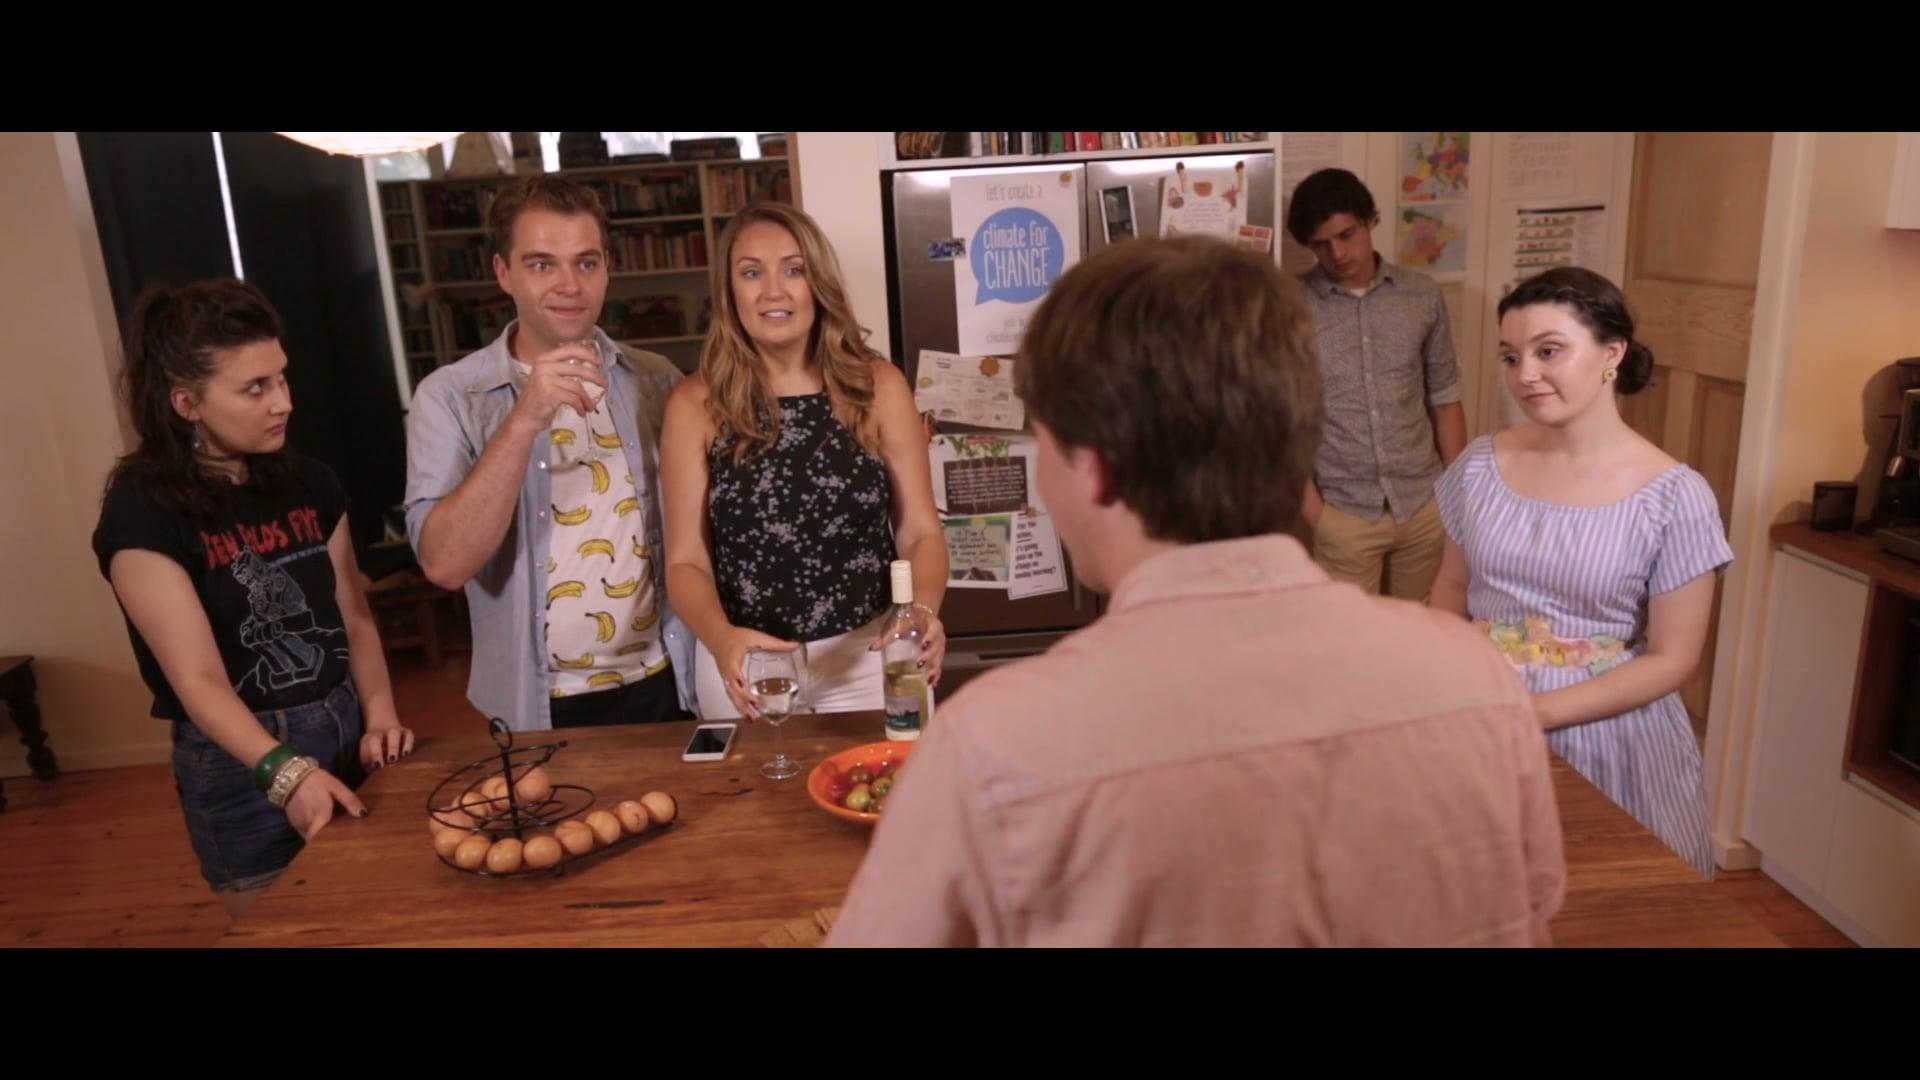 Real Friends - A Short Romantic Comedy